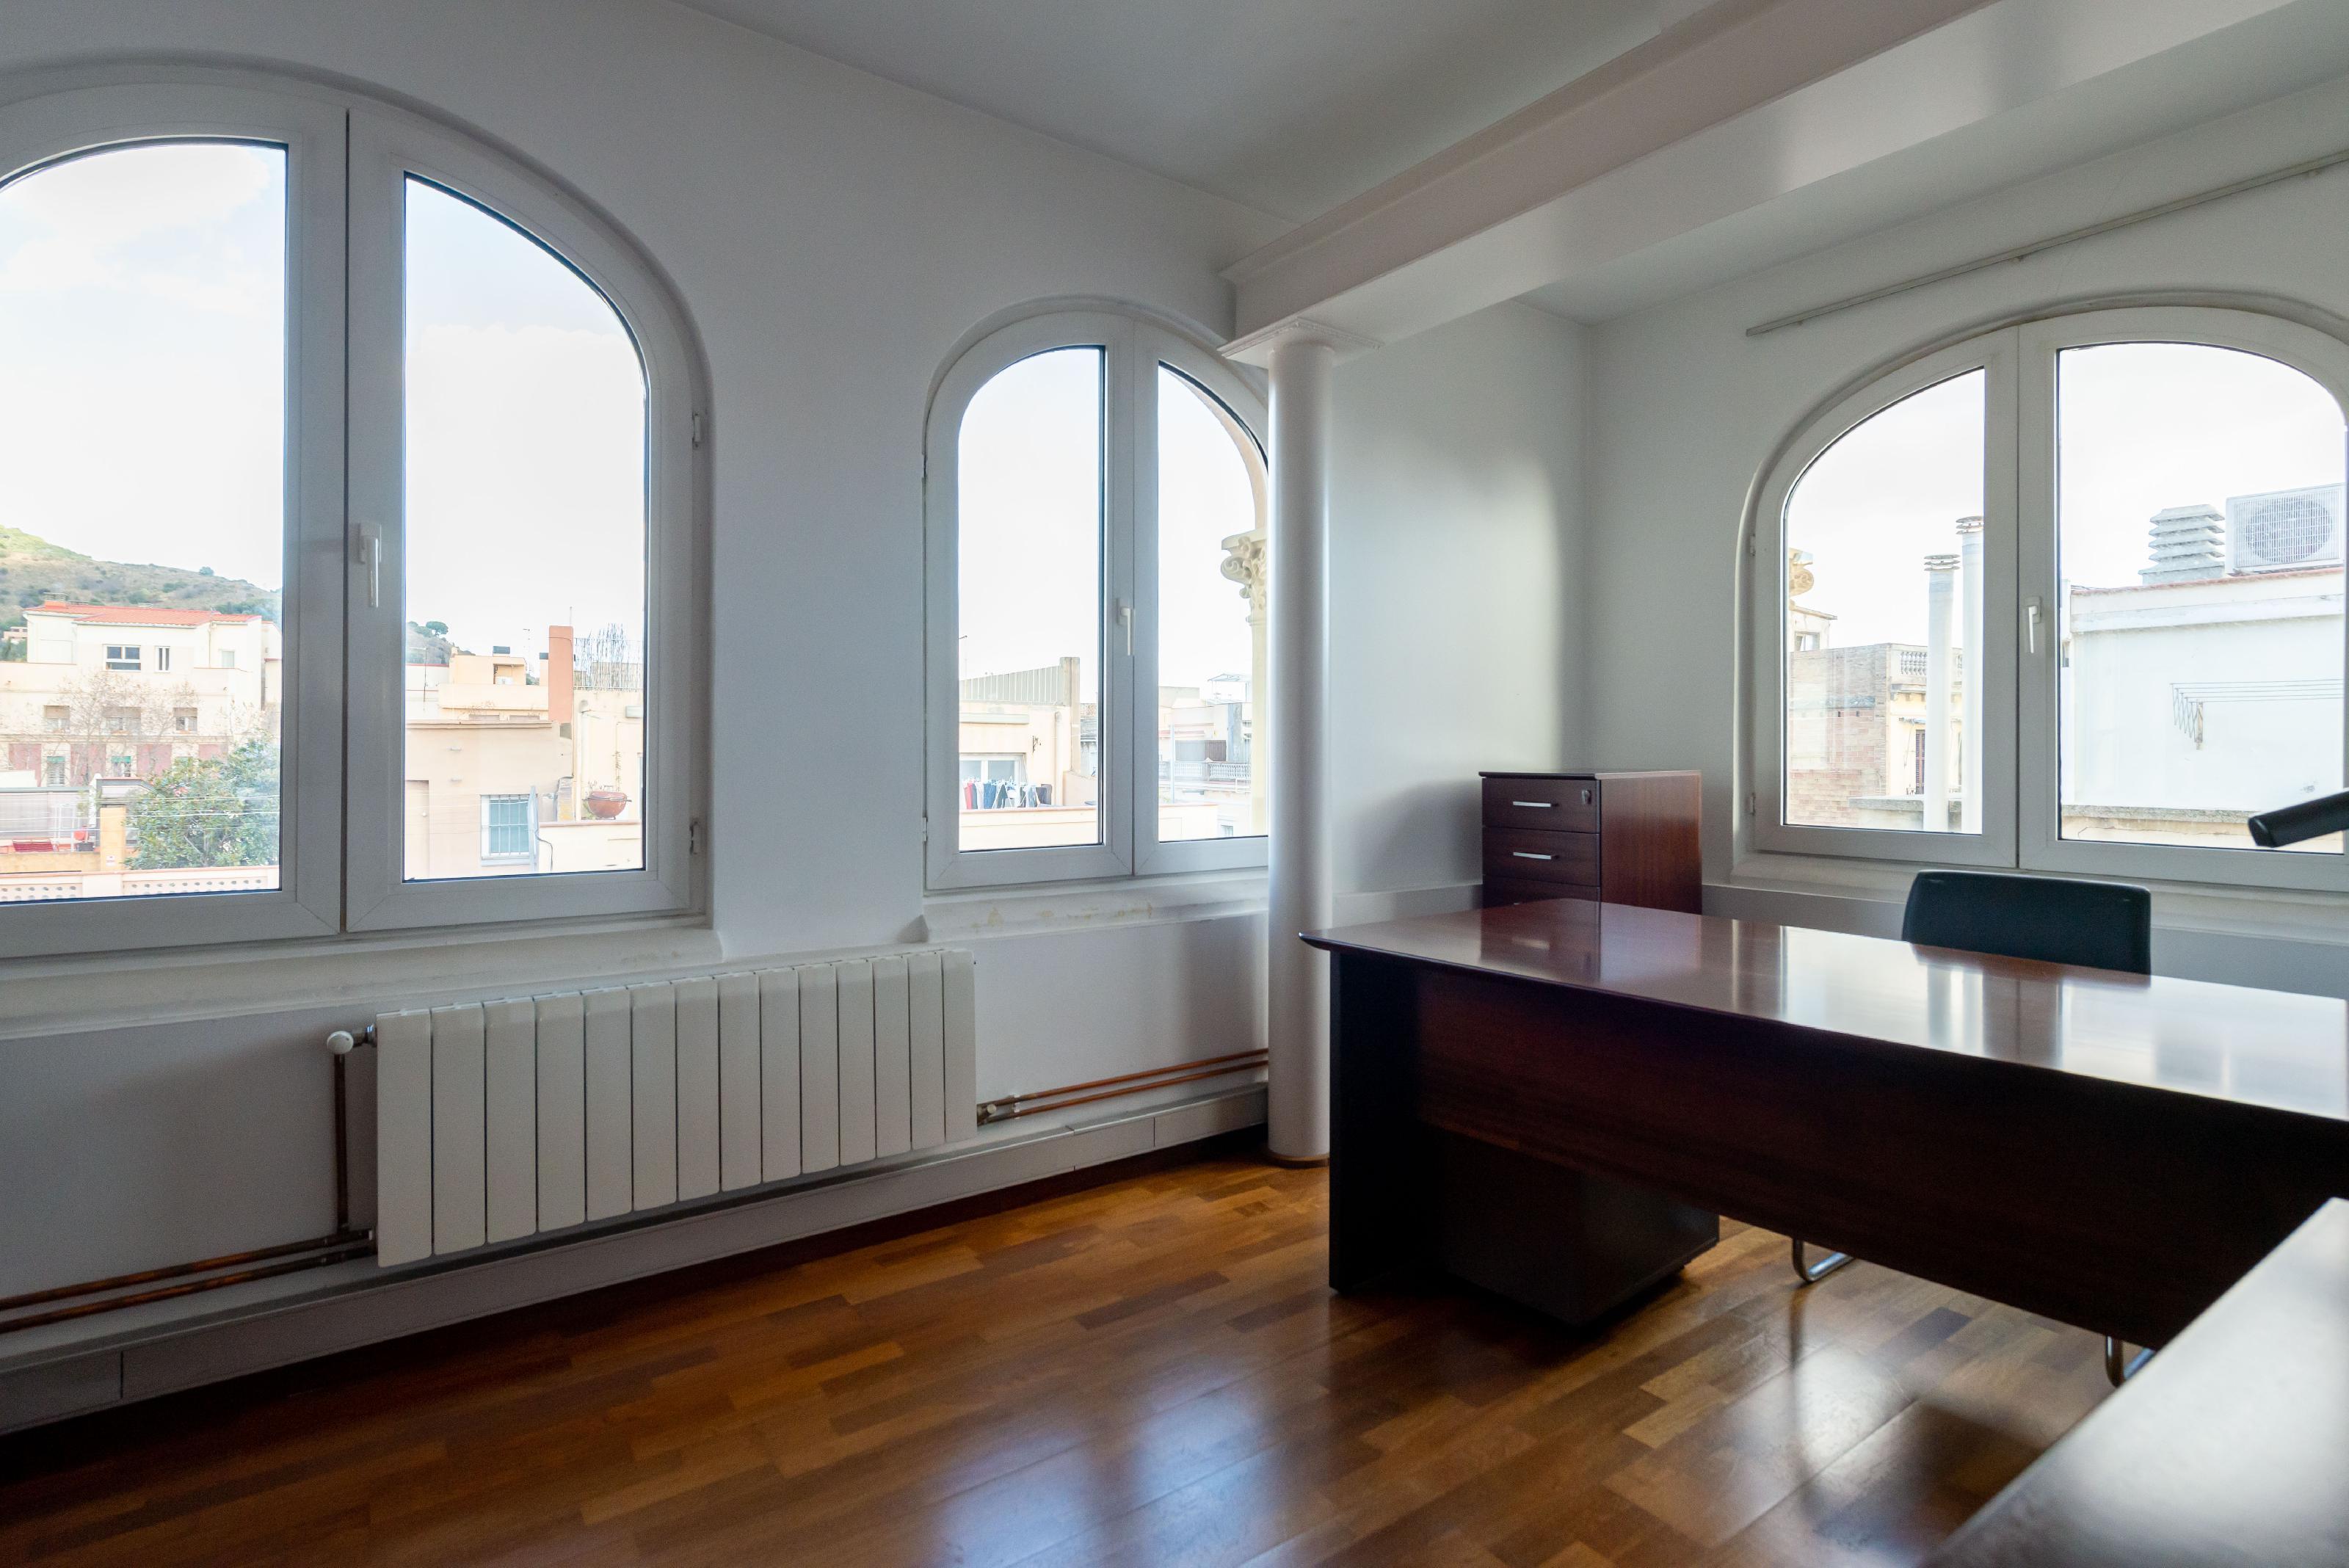 246066 Penthouse for sale in Sarrià-Sant Gervasi, Sarrià 10